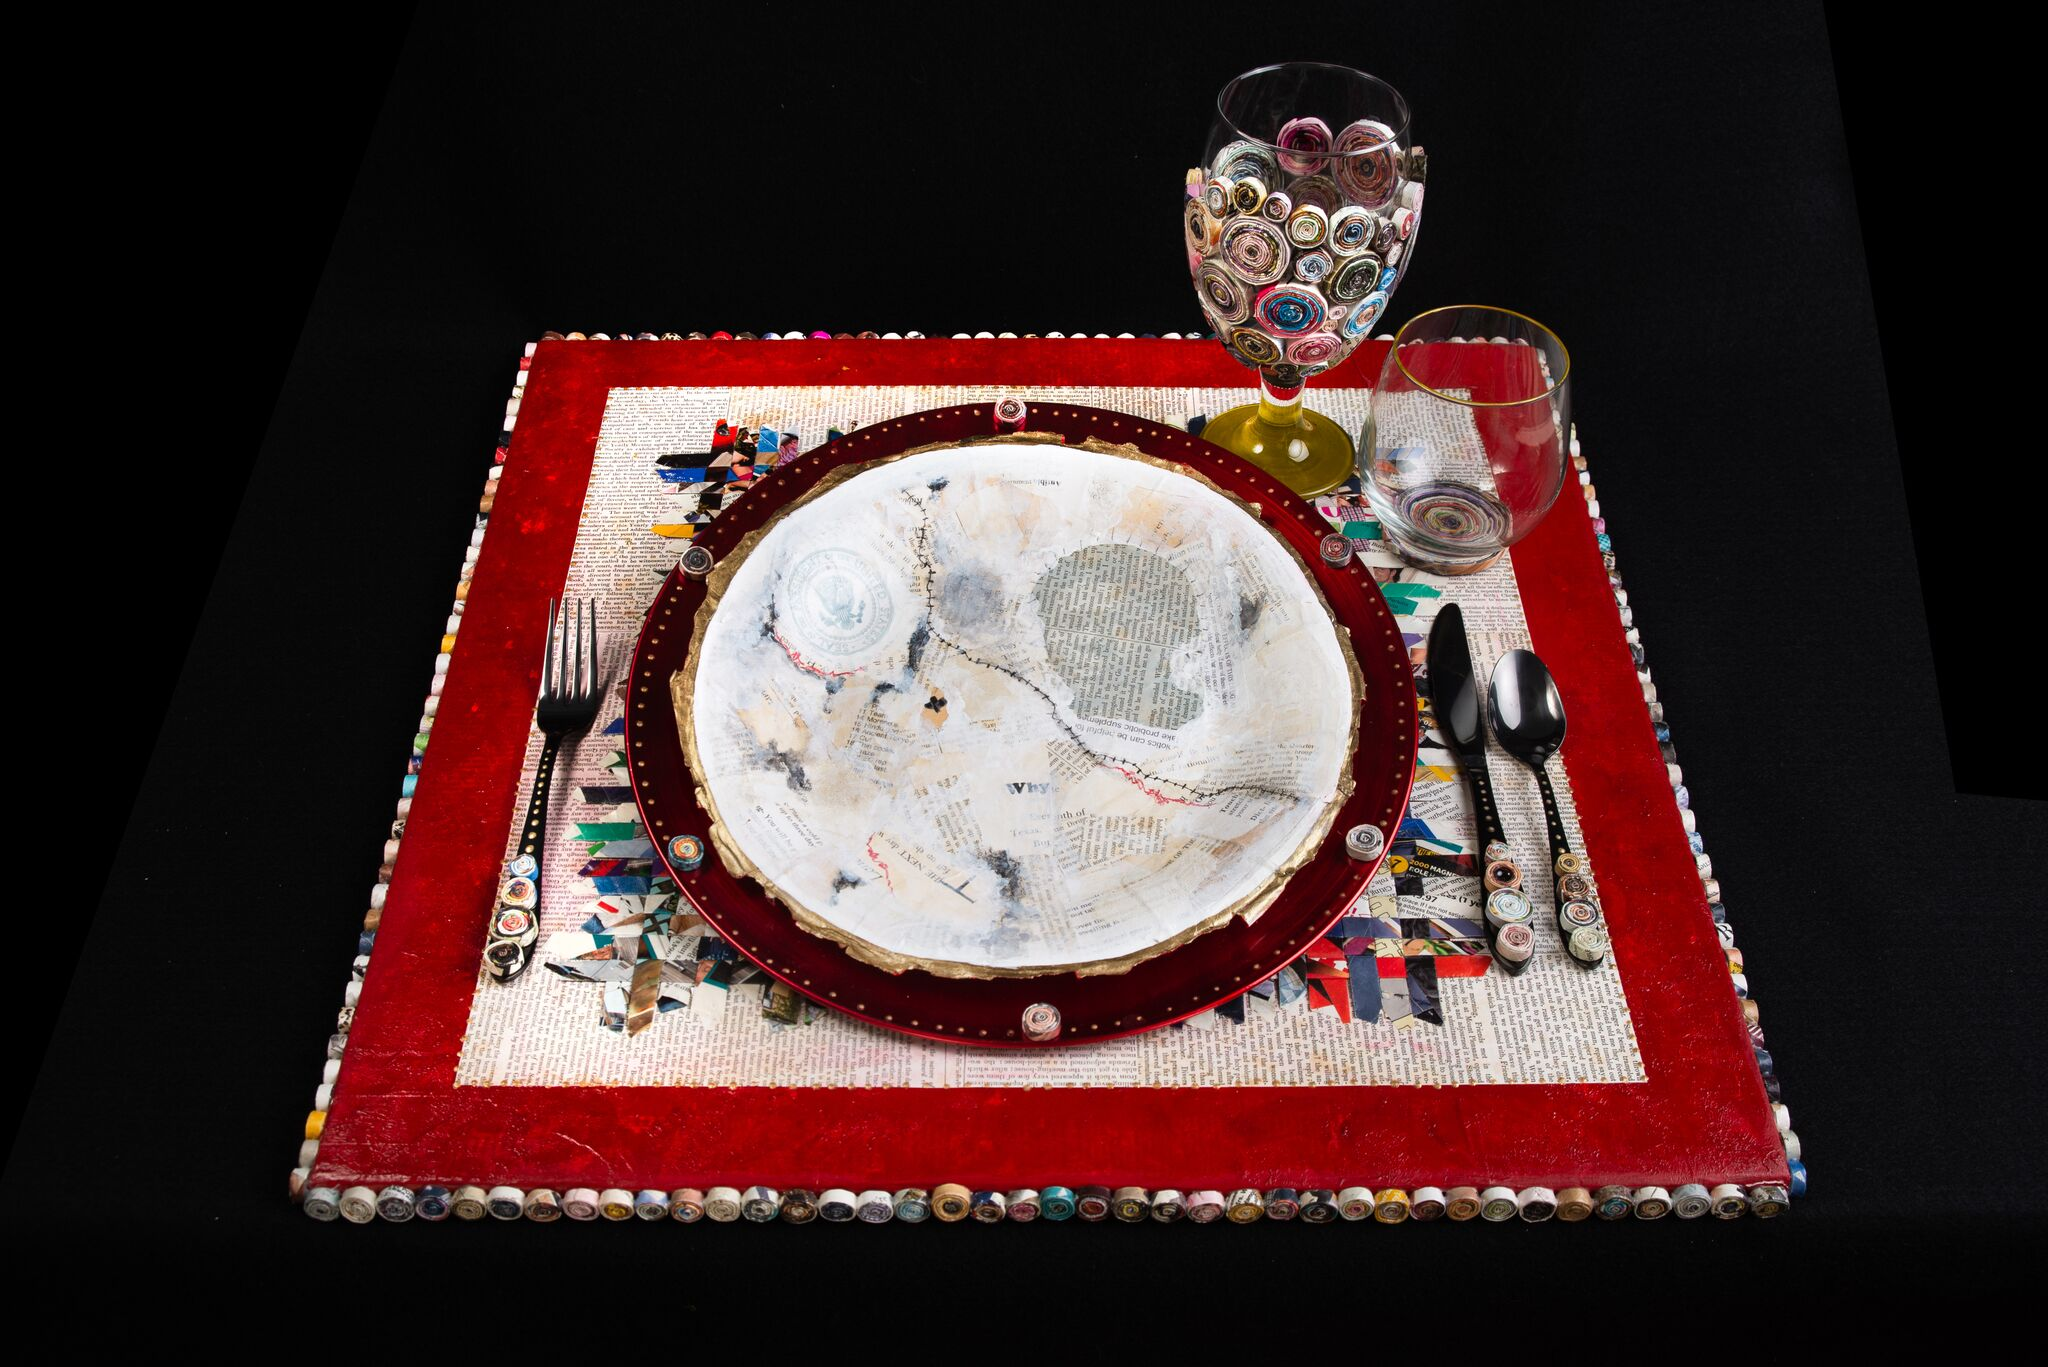 Supper Table Flavia final.jpeg